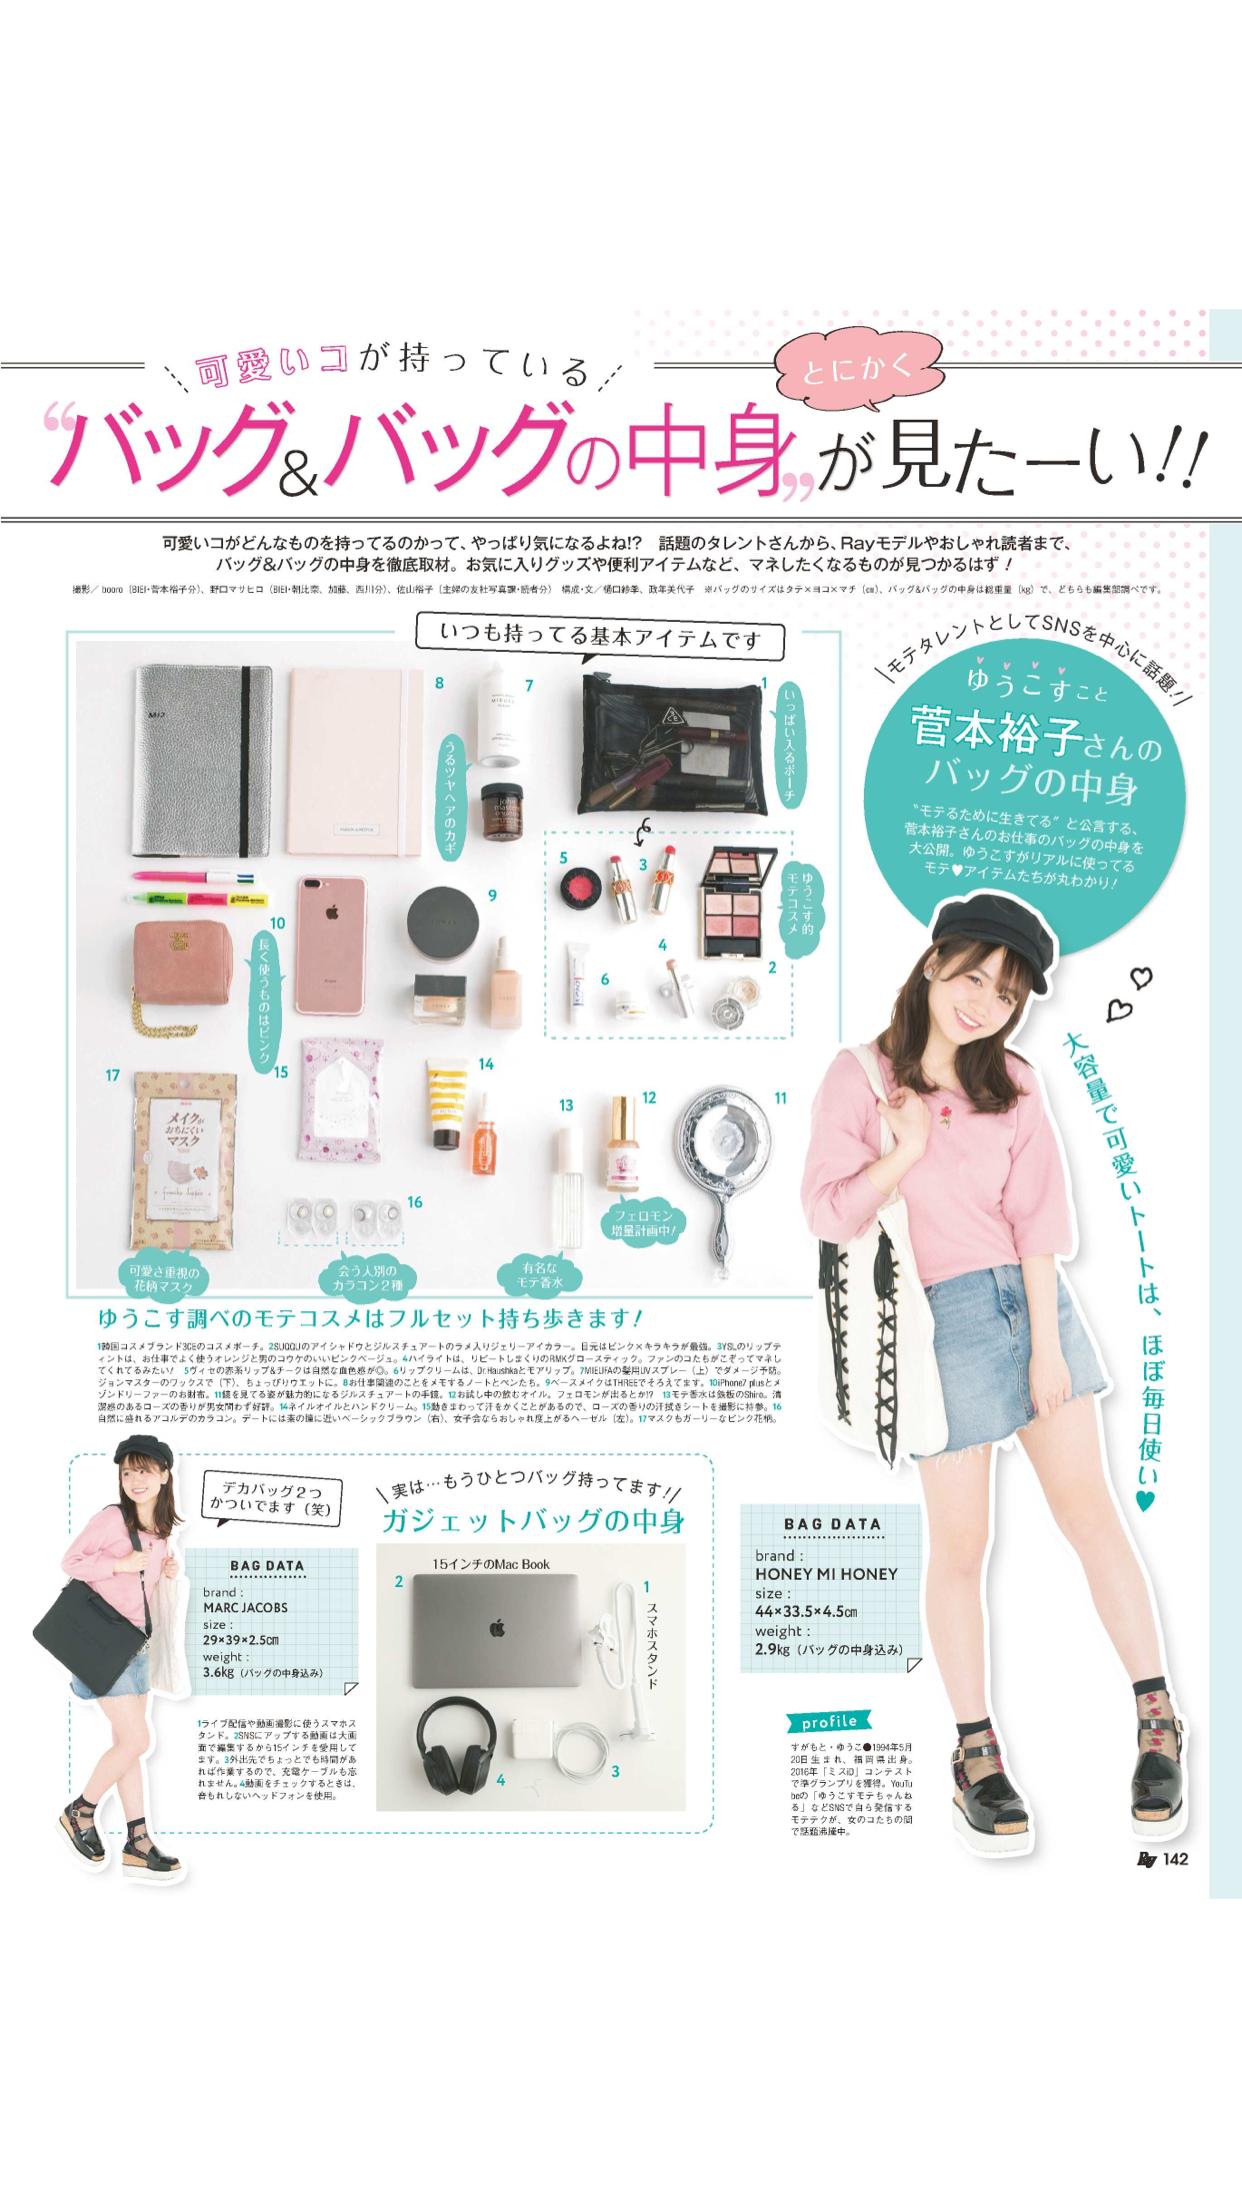 87ba6089518794 what's in my bag」おしゃれまとめの人気アイデア|Pinterest |Phoebe ...